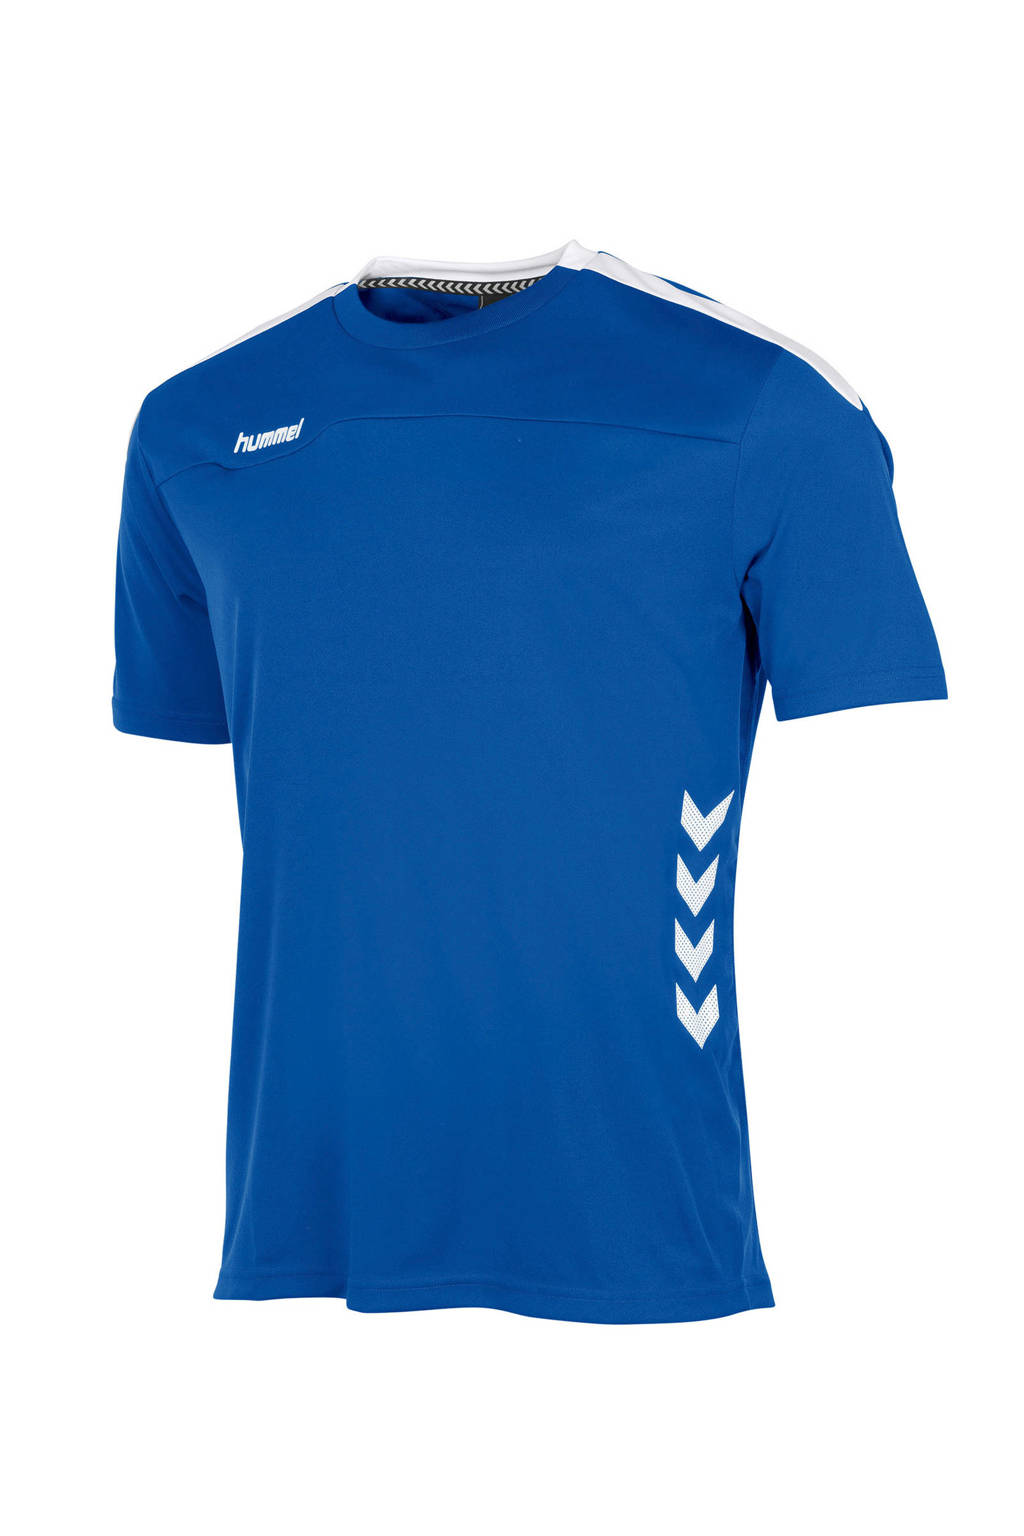 hummel   sport T-shirt blauw, Blauw/wit